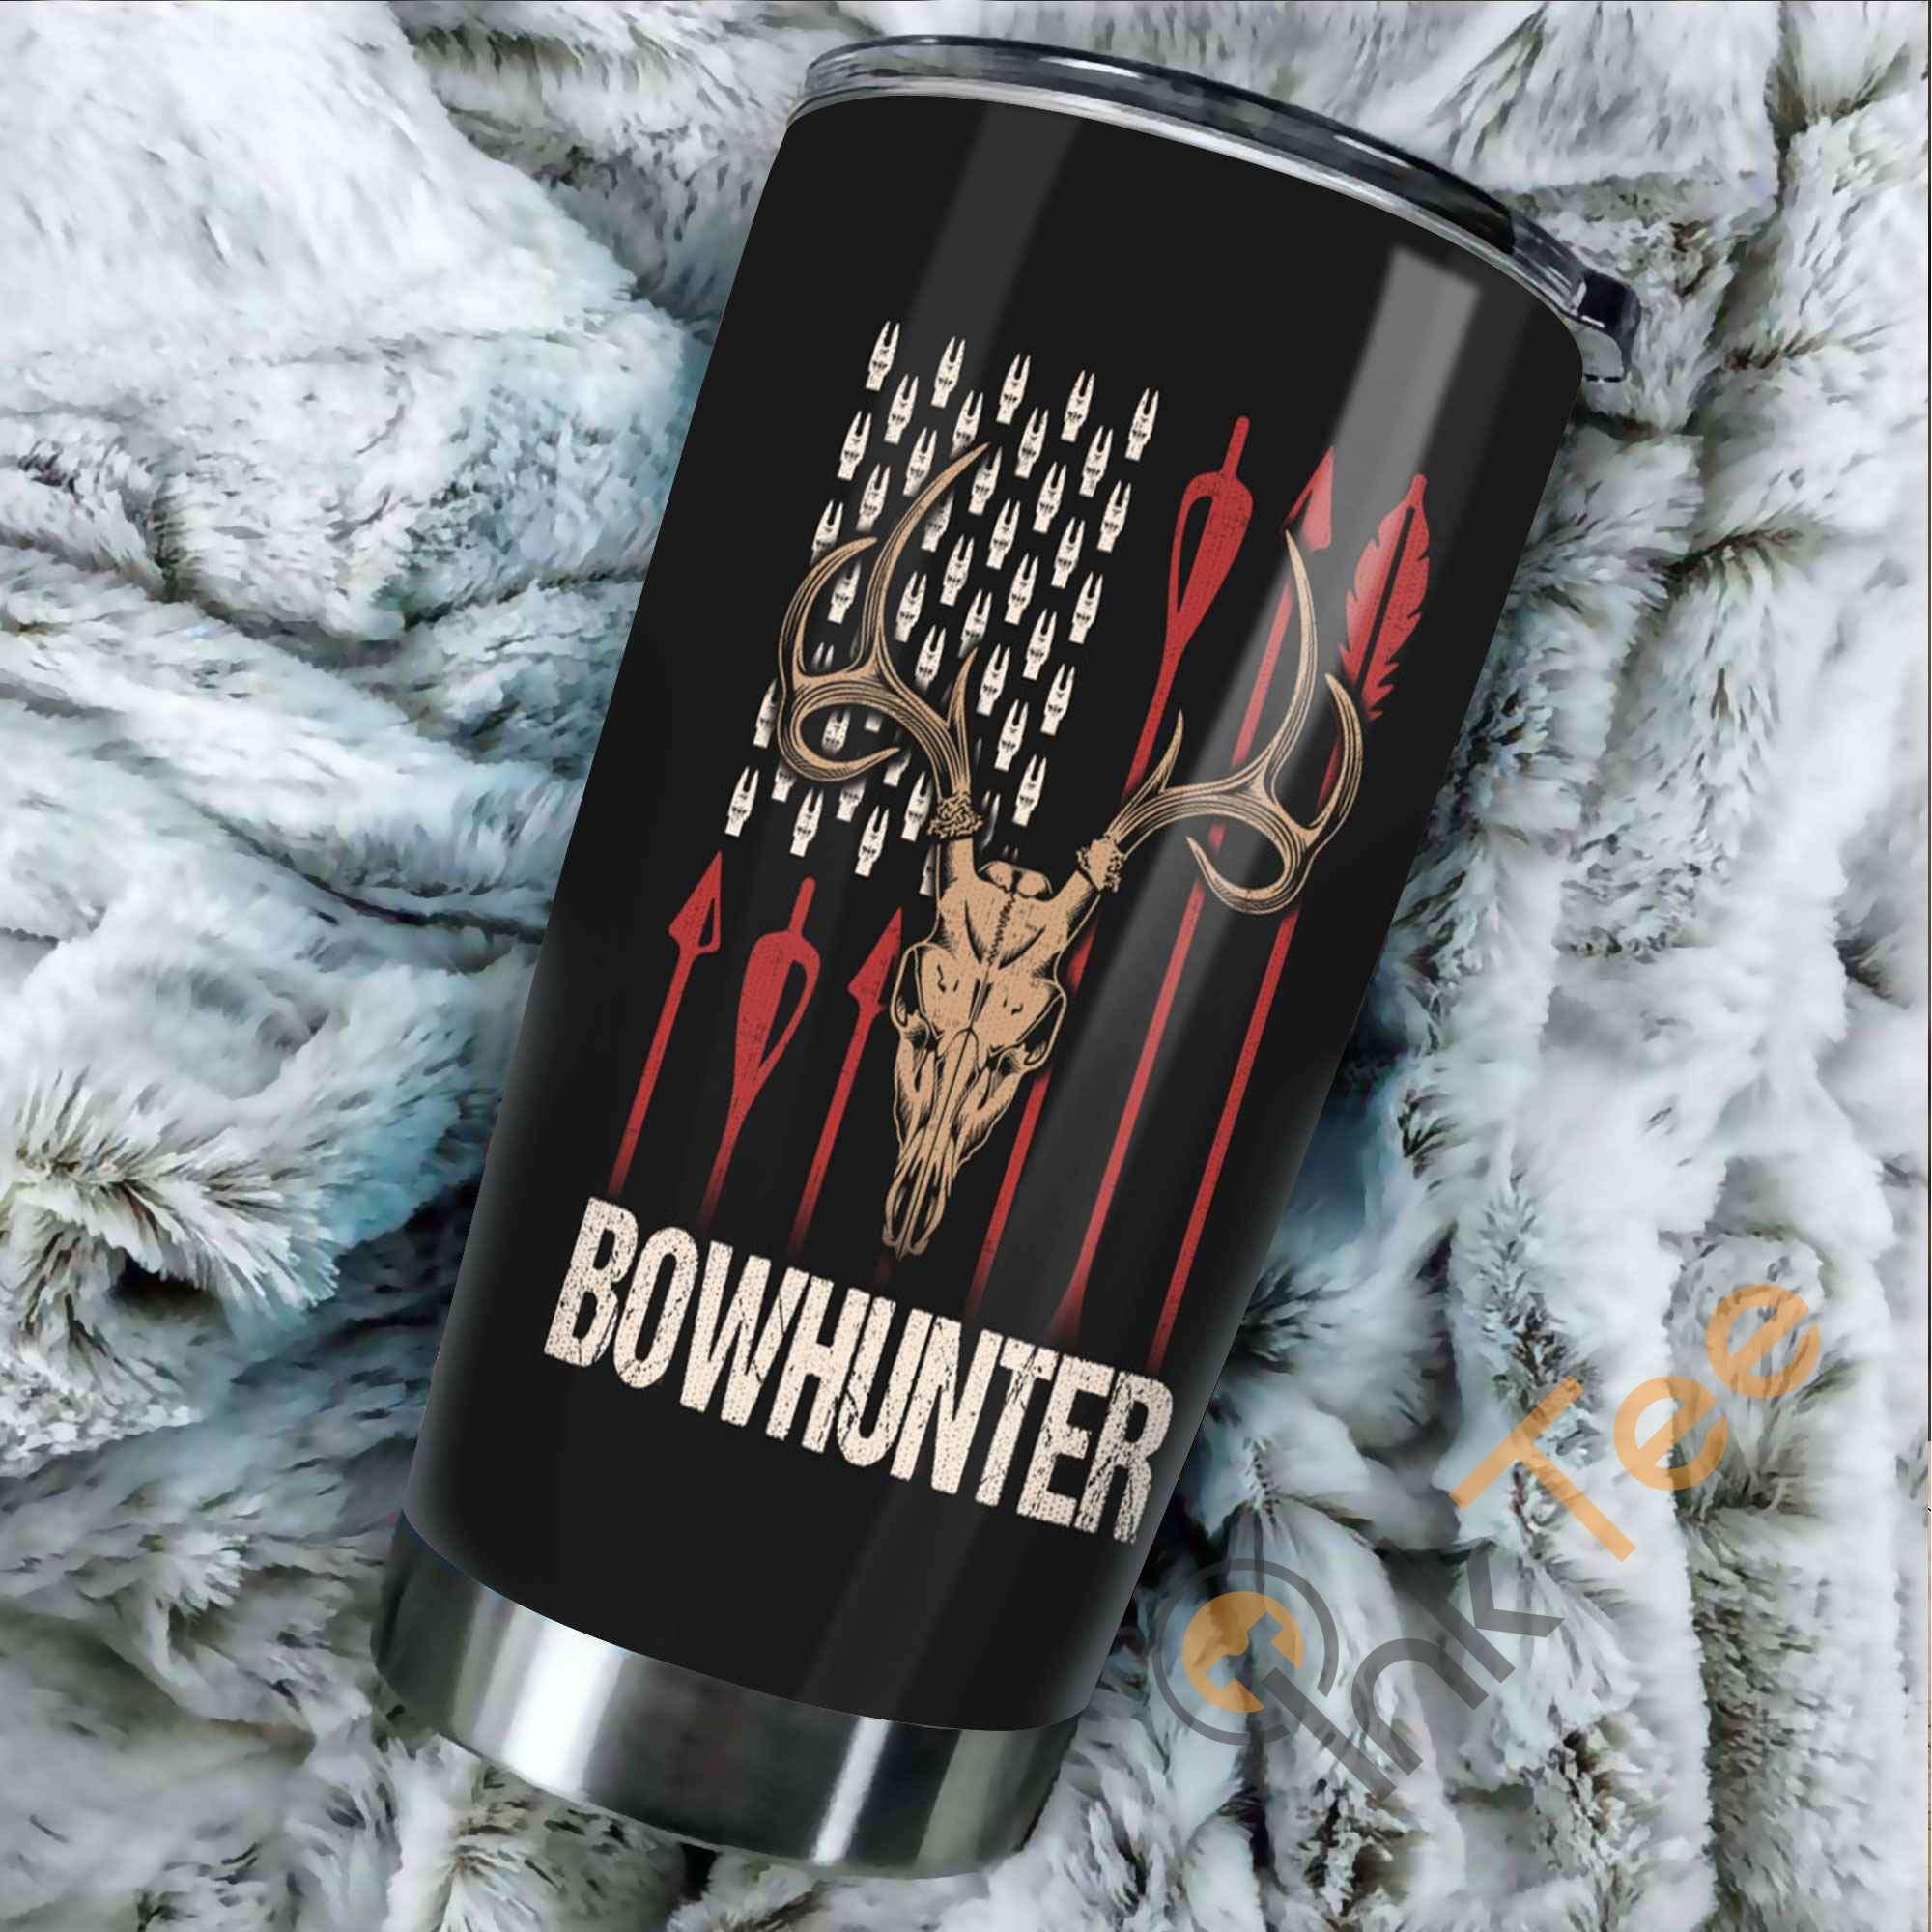 Bow Hunting Amazon Best Seller Sku 3053 Stainless Steel Tumbler